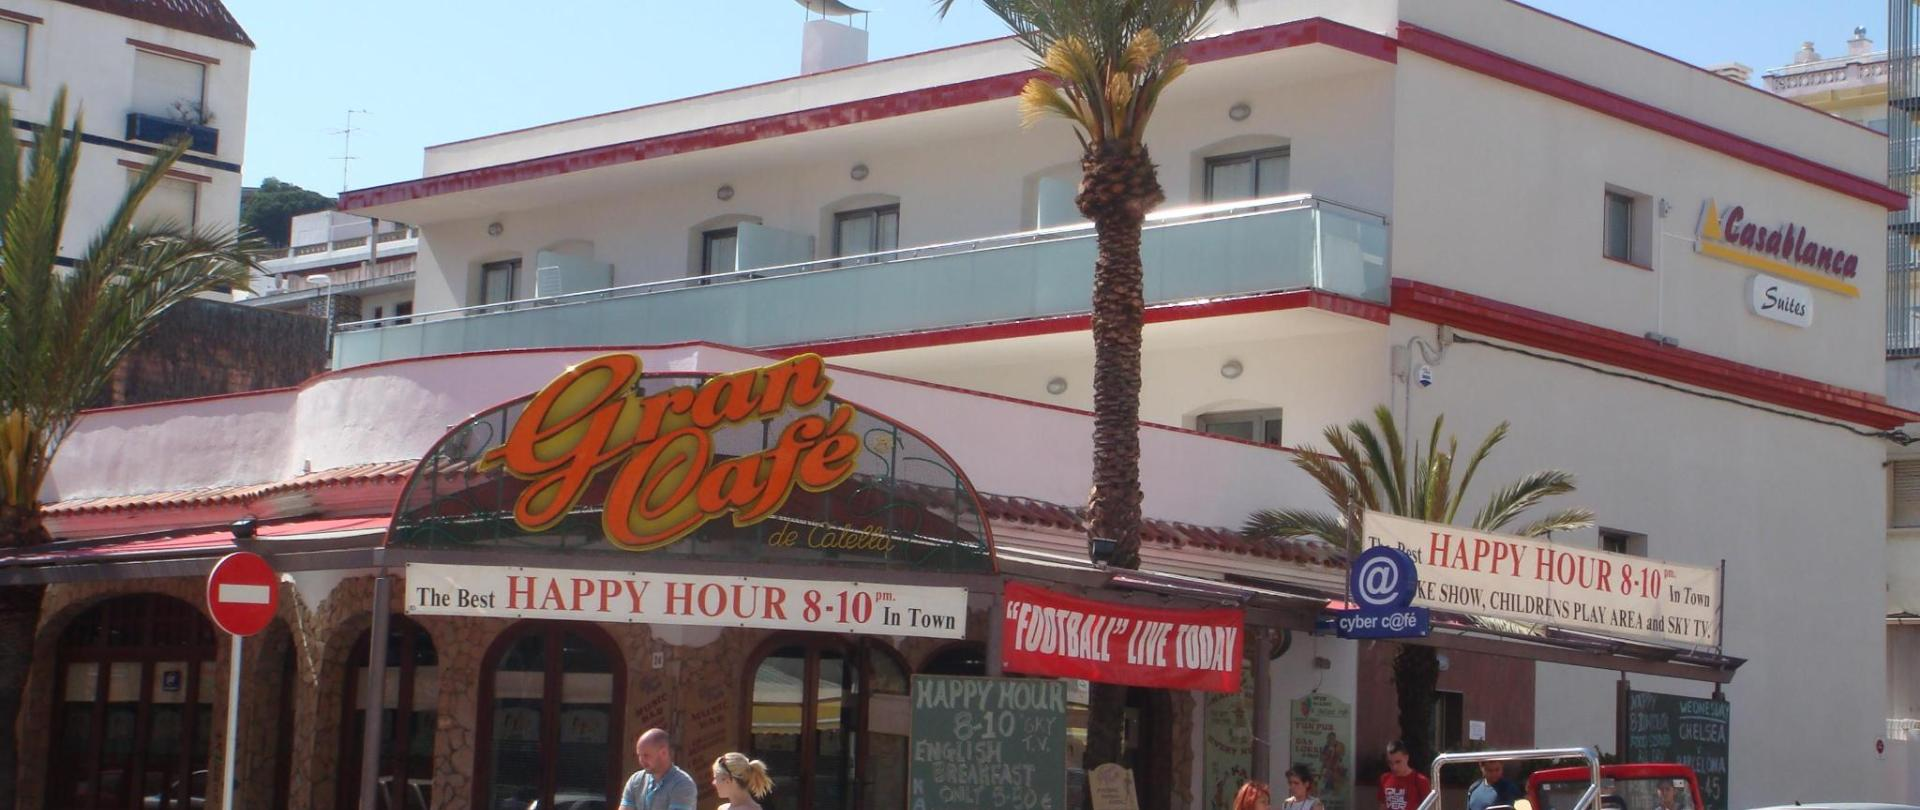 Front Casablanca Suites.JPG